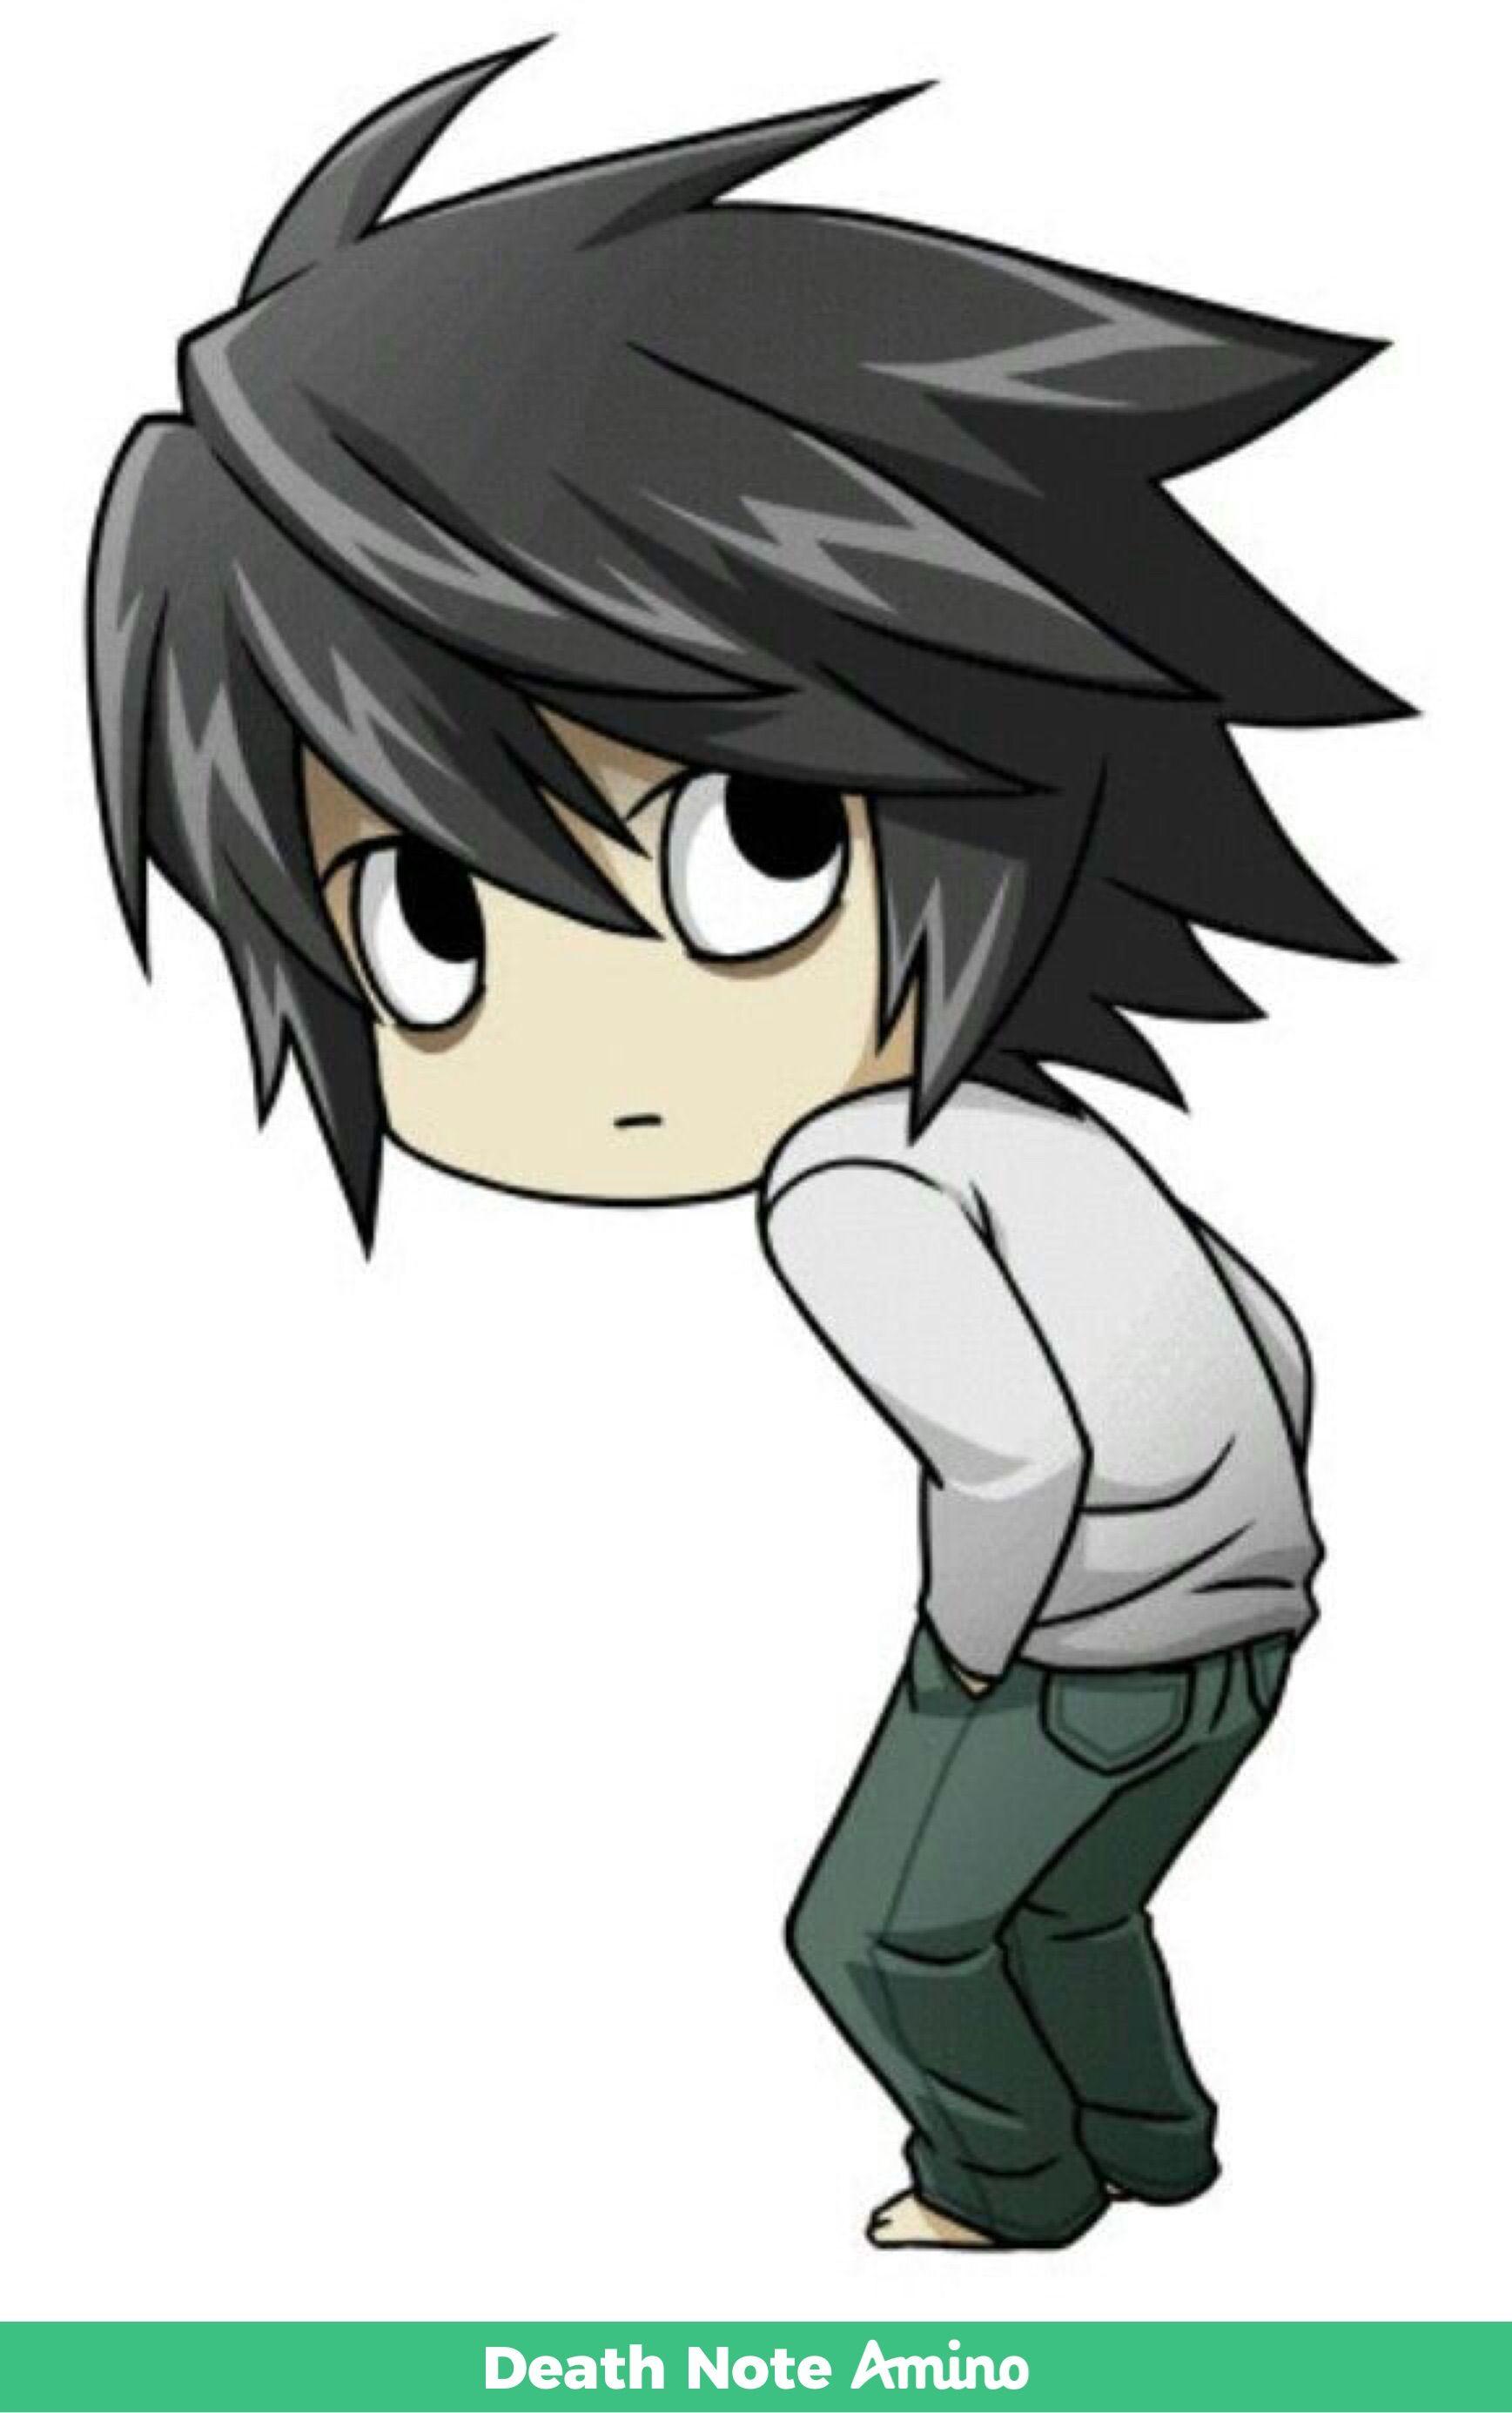 Gambar Gambar Anime Oleh Nat Monteiro Pada Death Note Animasi Seni